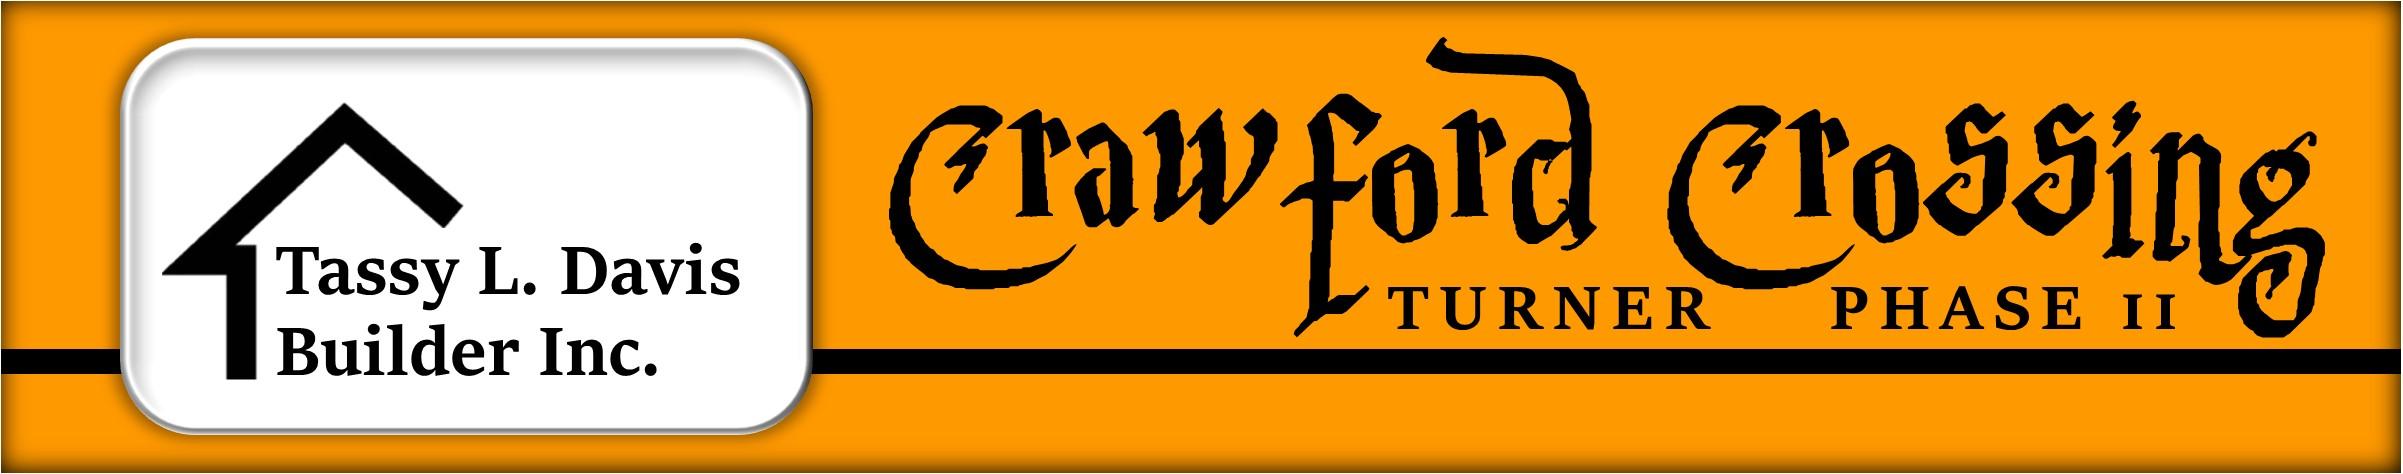 Crawford Crossing Phase 2